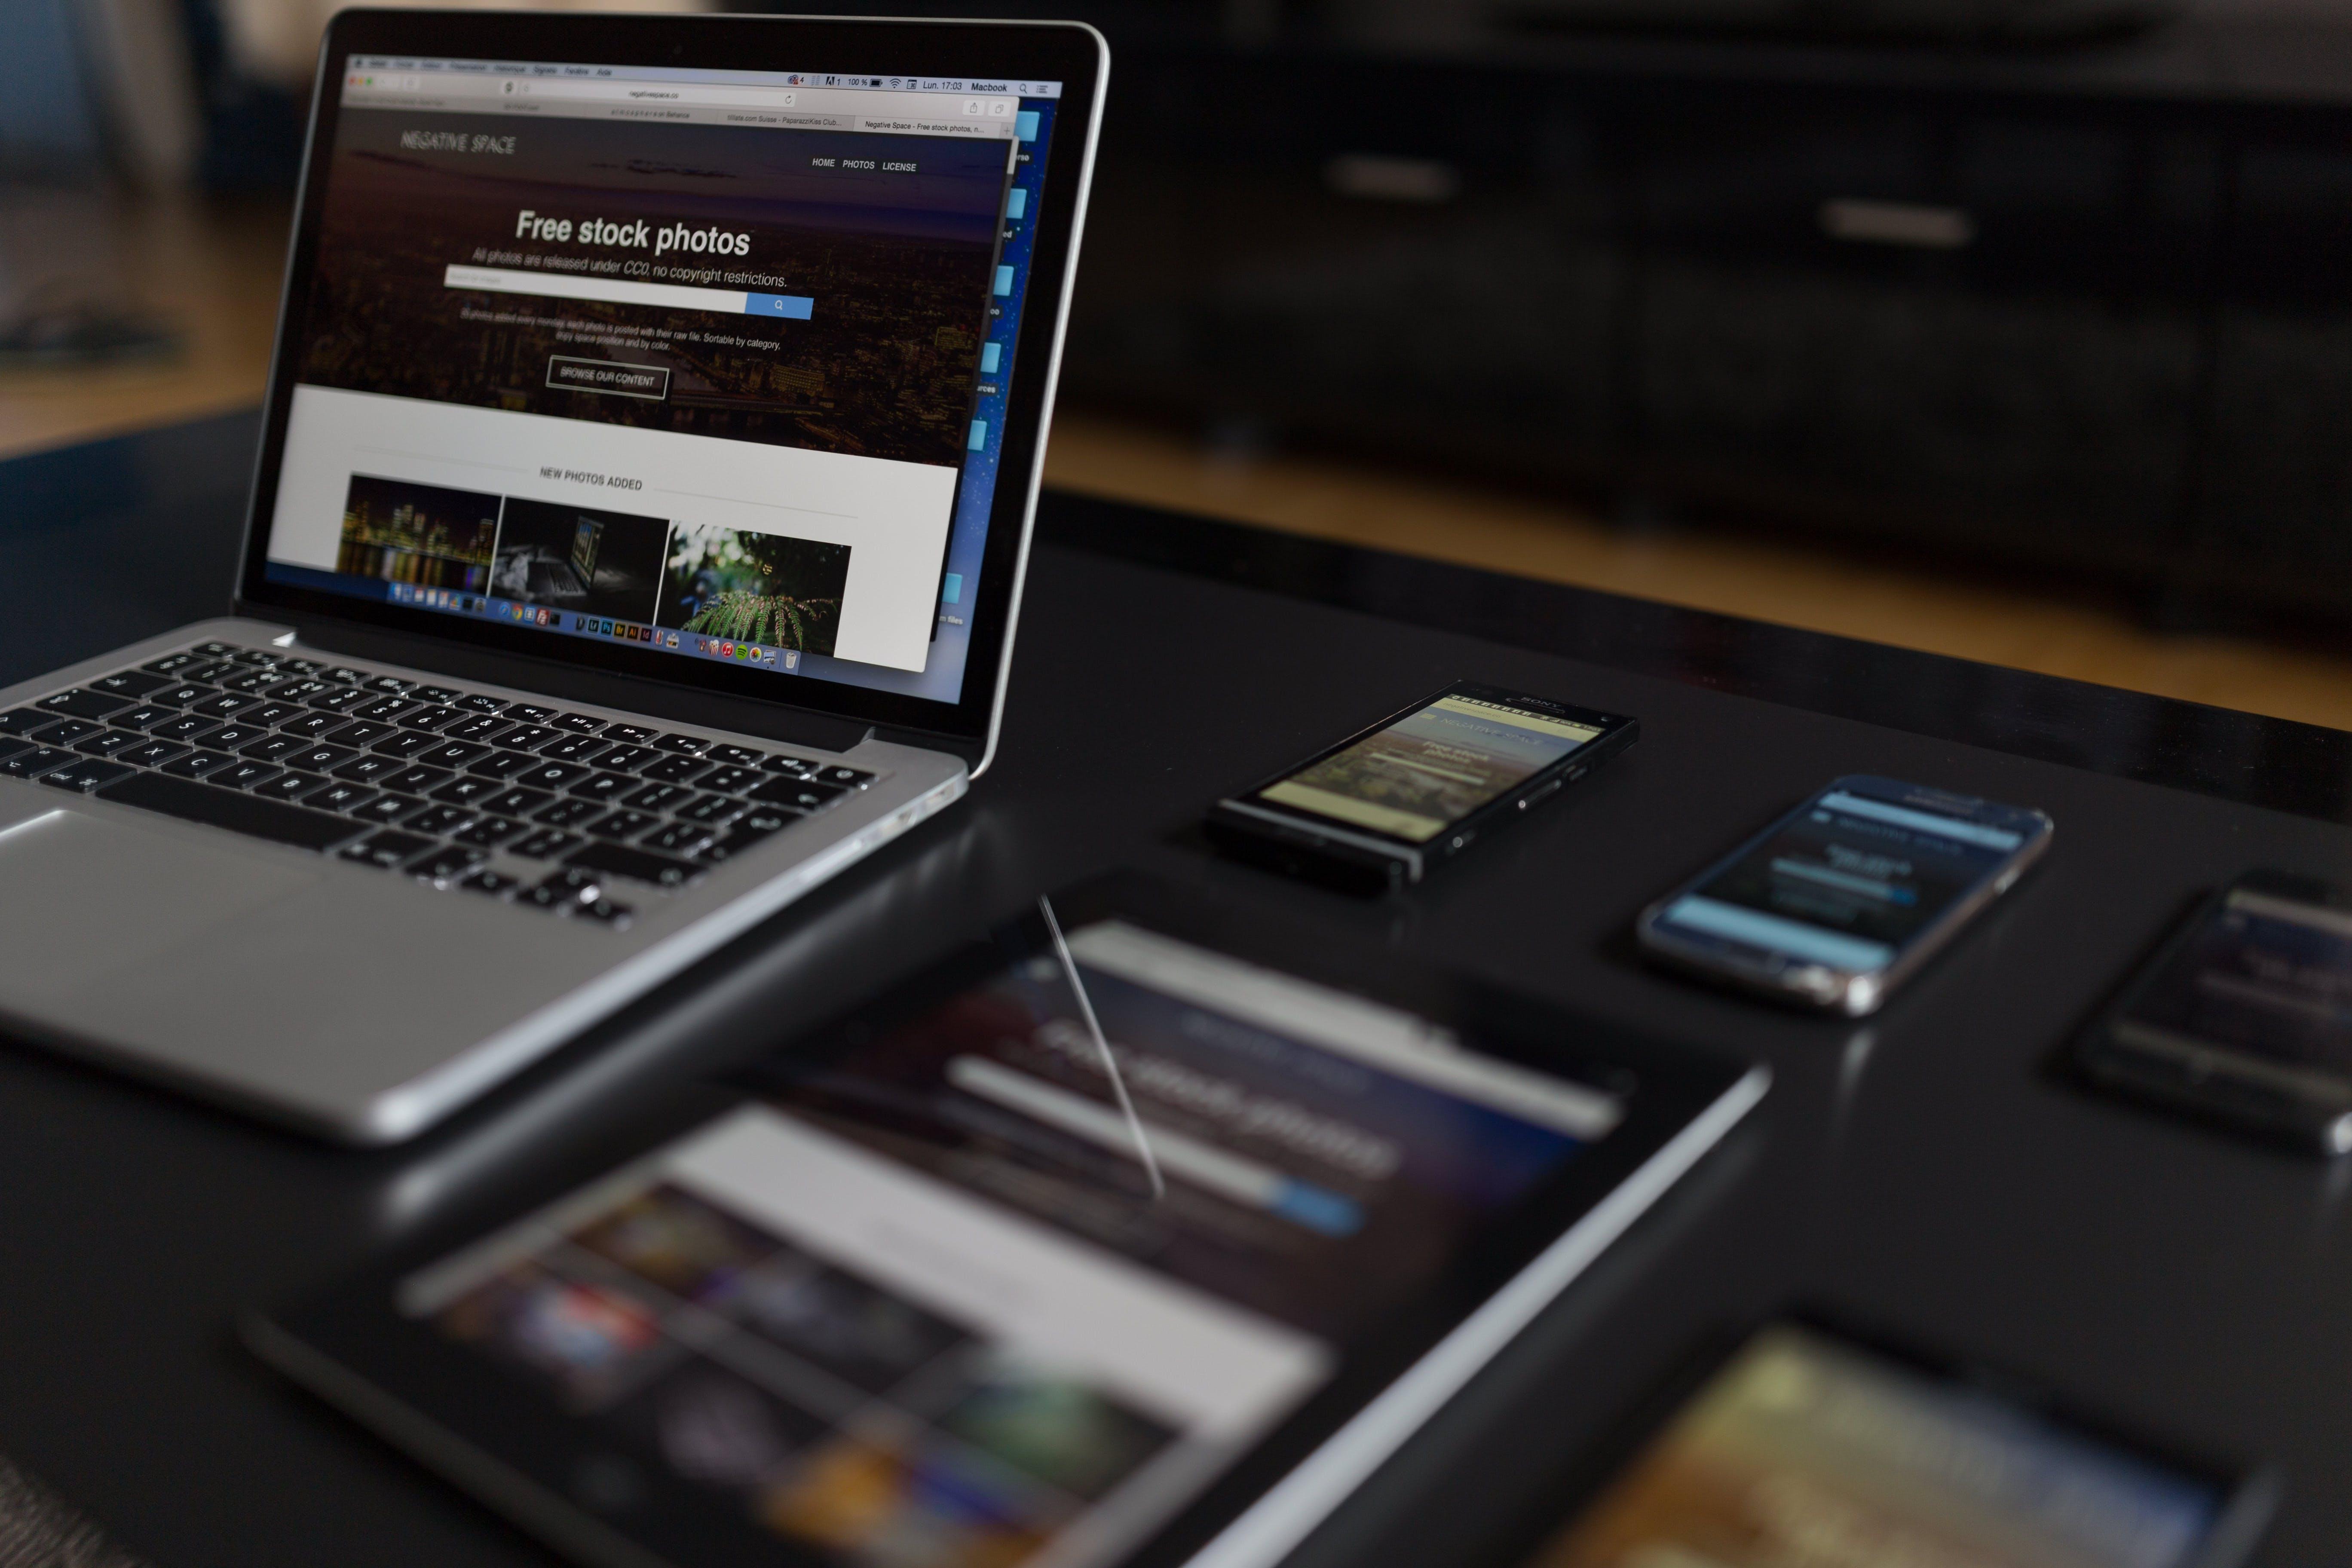 iPad, iphone, インターネット, ウェブの無料の写真素材